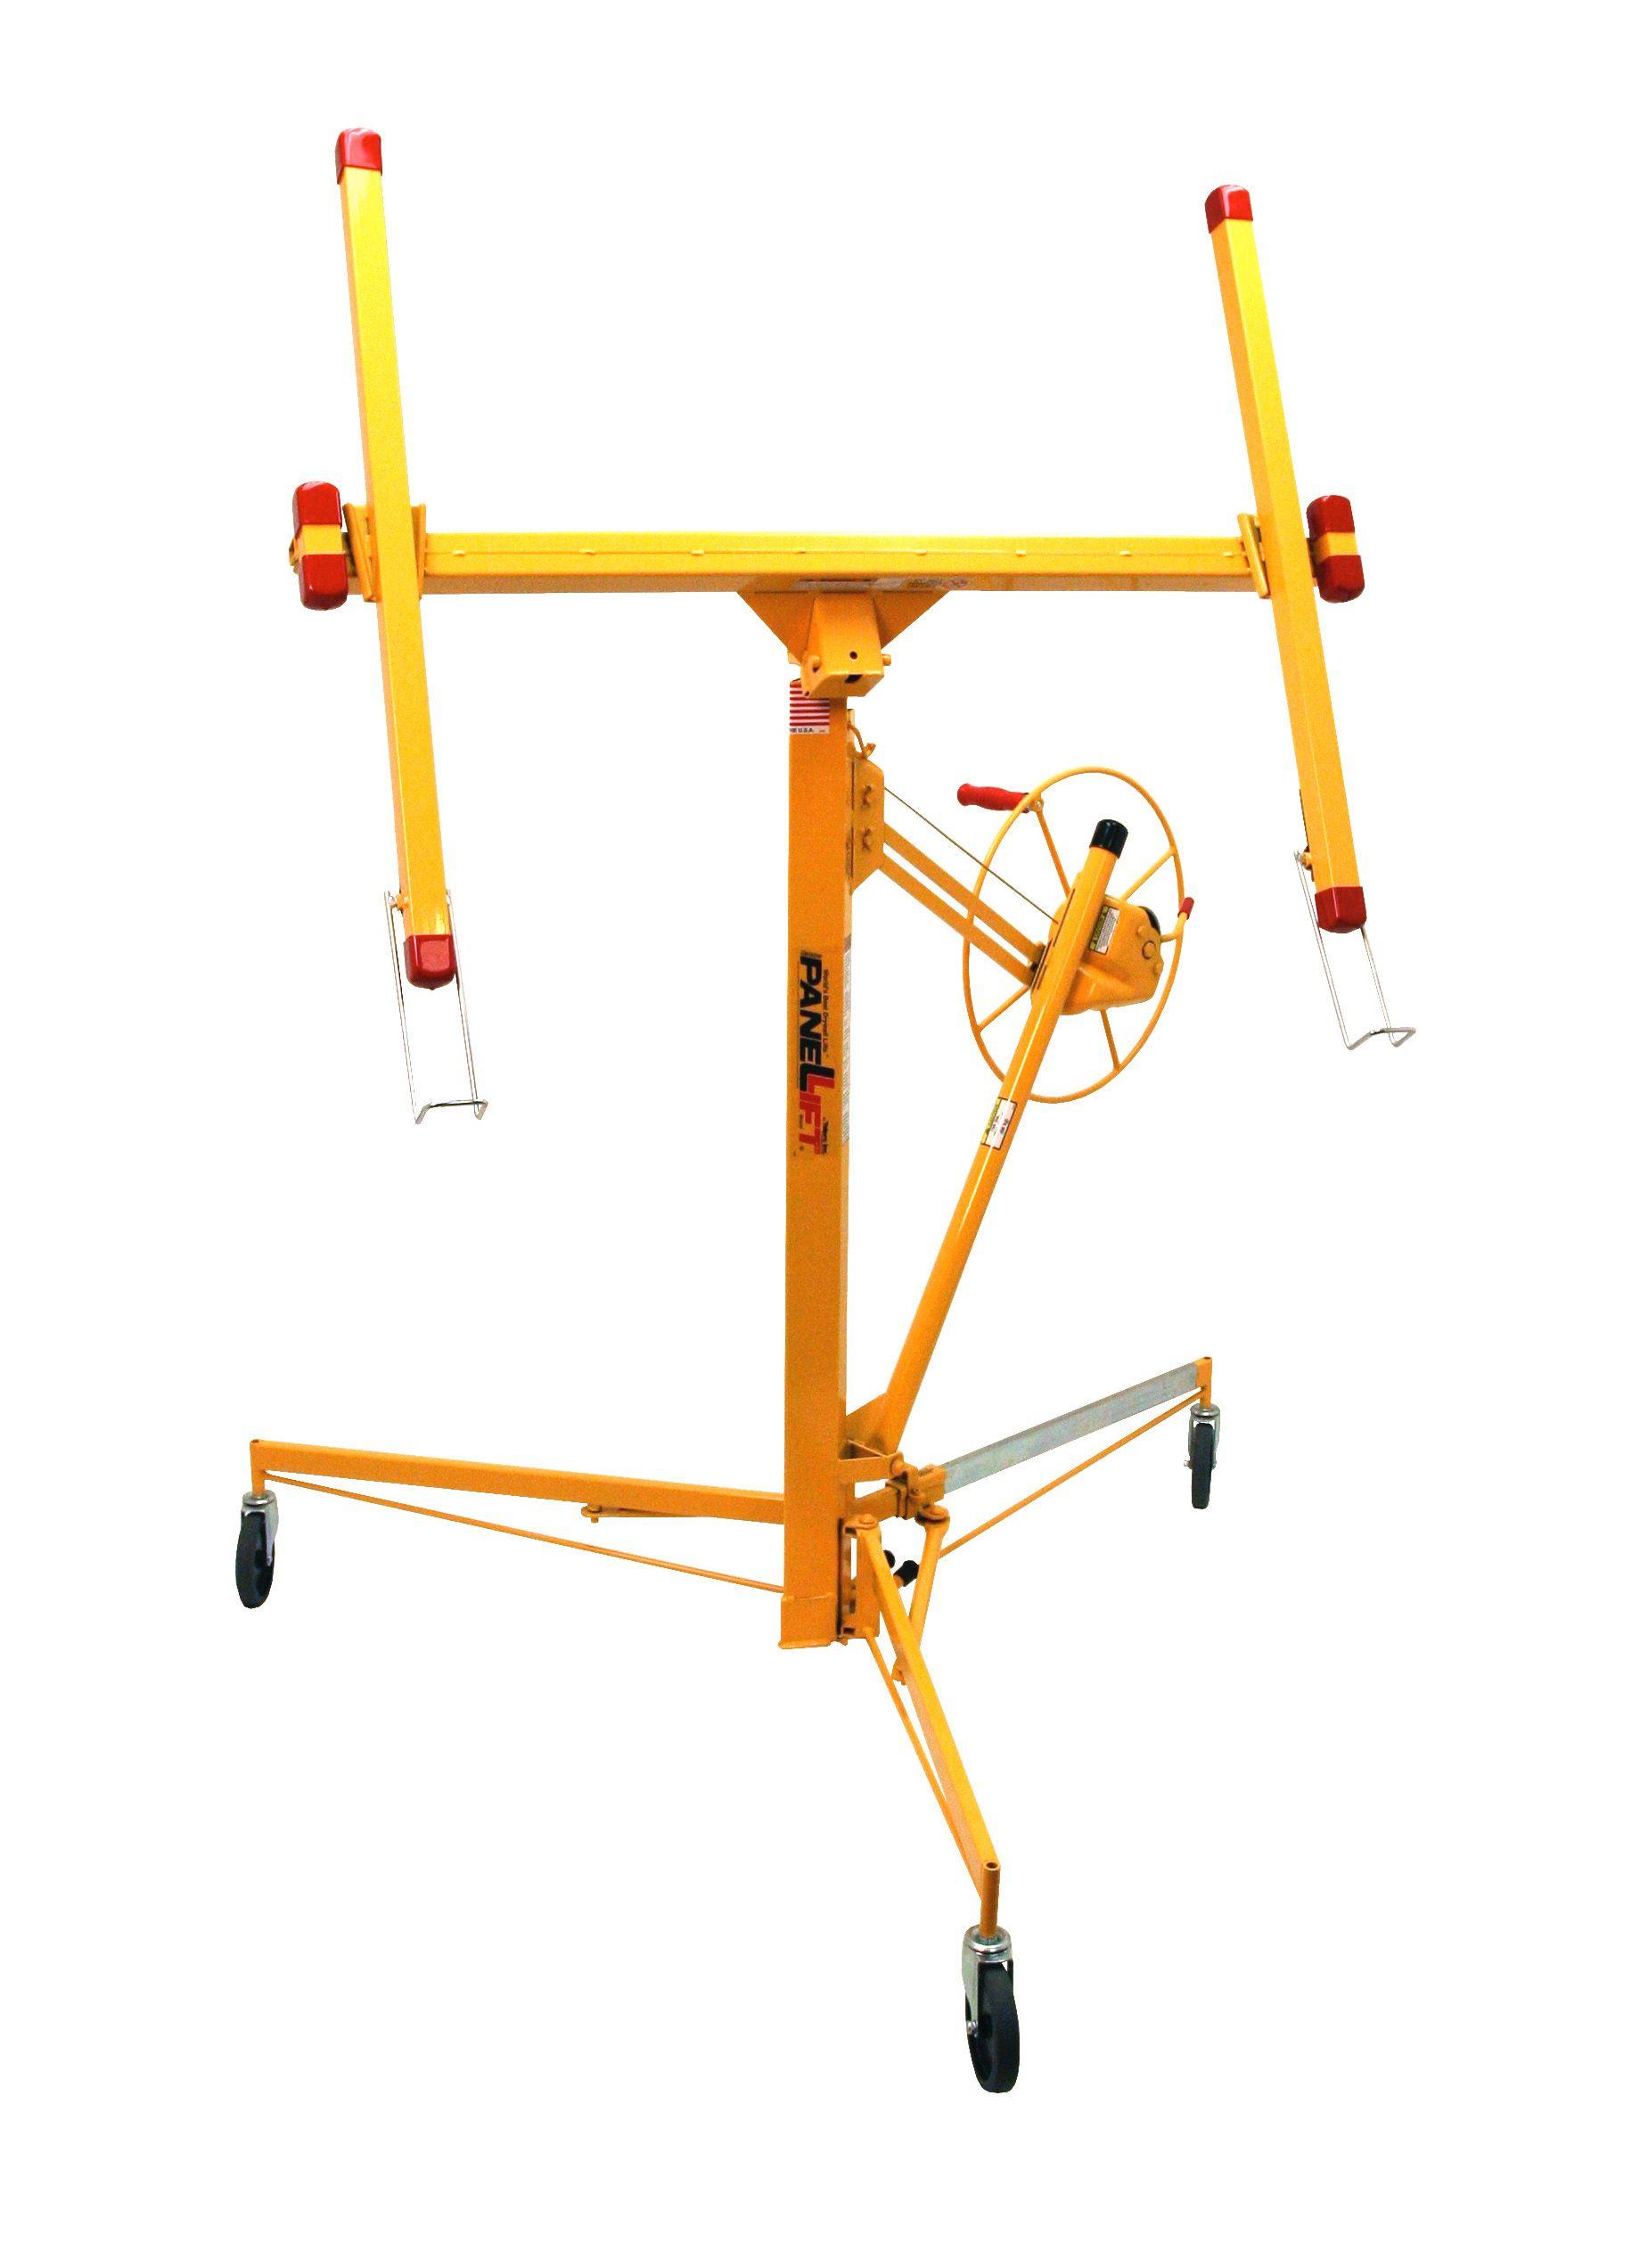 Mobile Drywall Lift Plaster Board Sheetrock Lifter Panel Hoist 11FT//150lbs//68kg